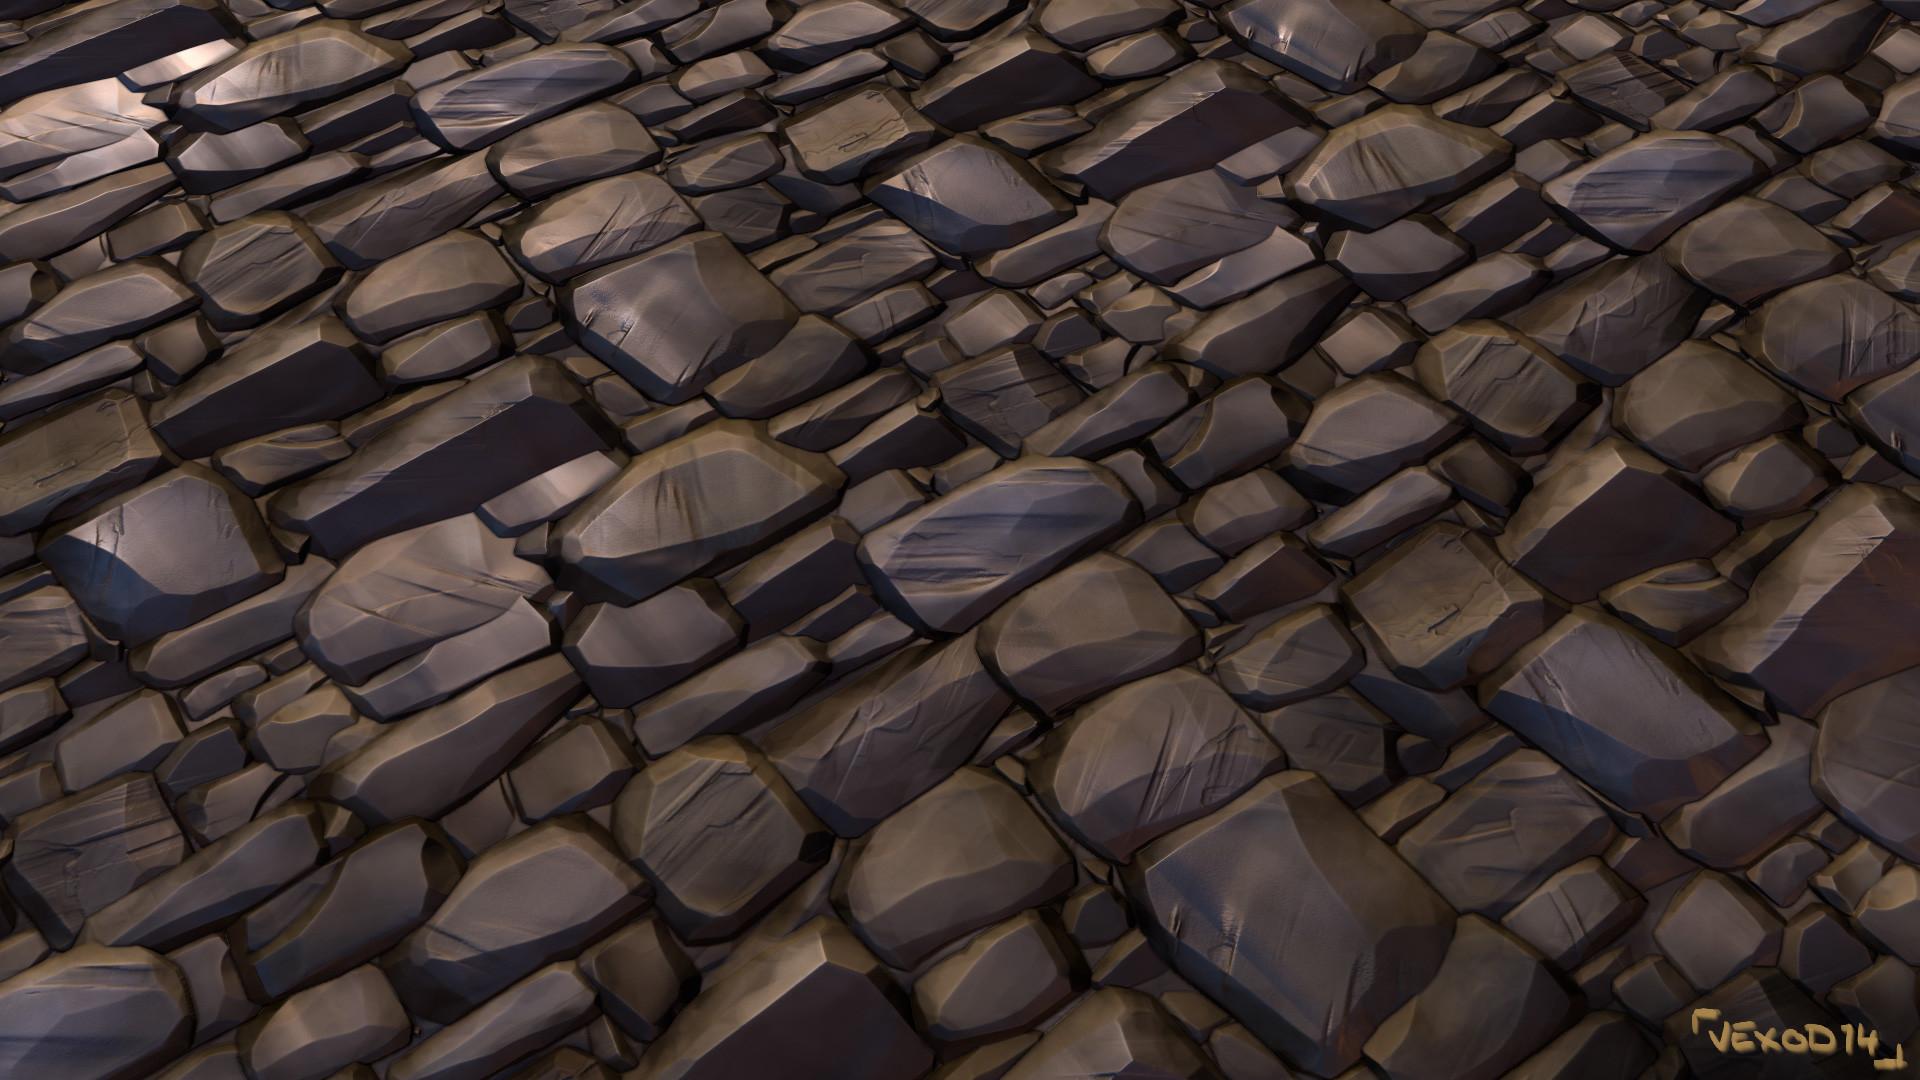 etienne-beschet-texturing-tile-wallbrick